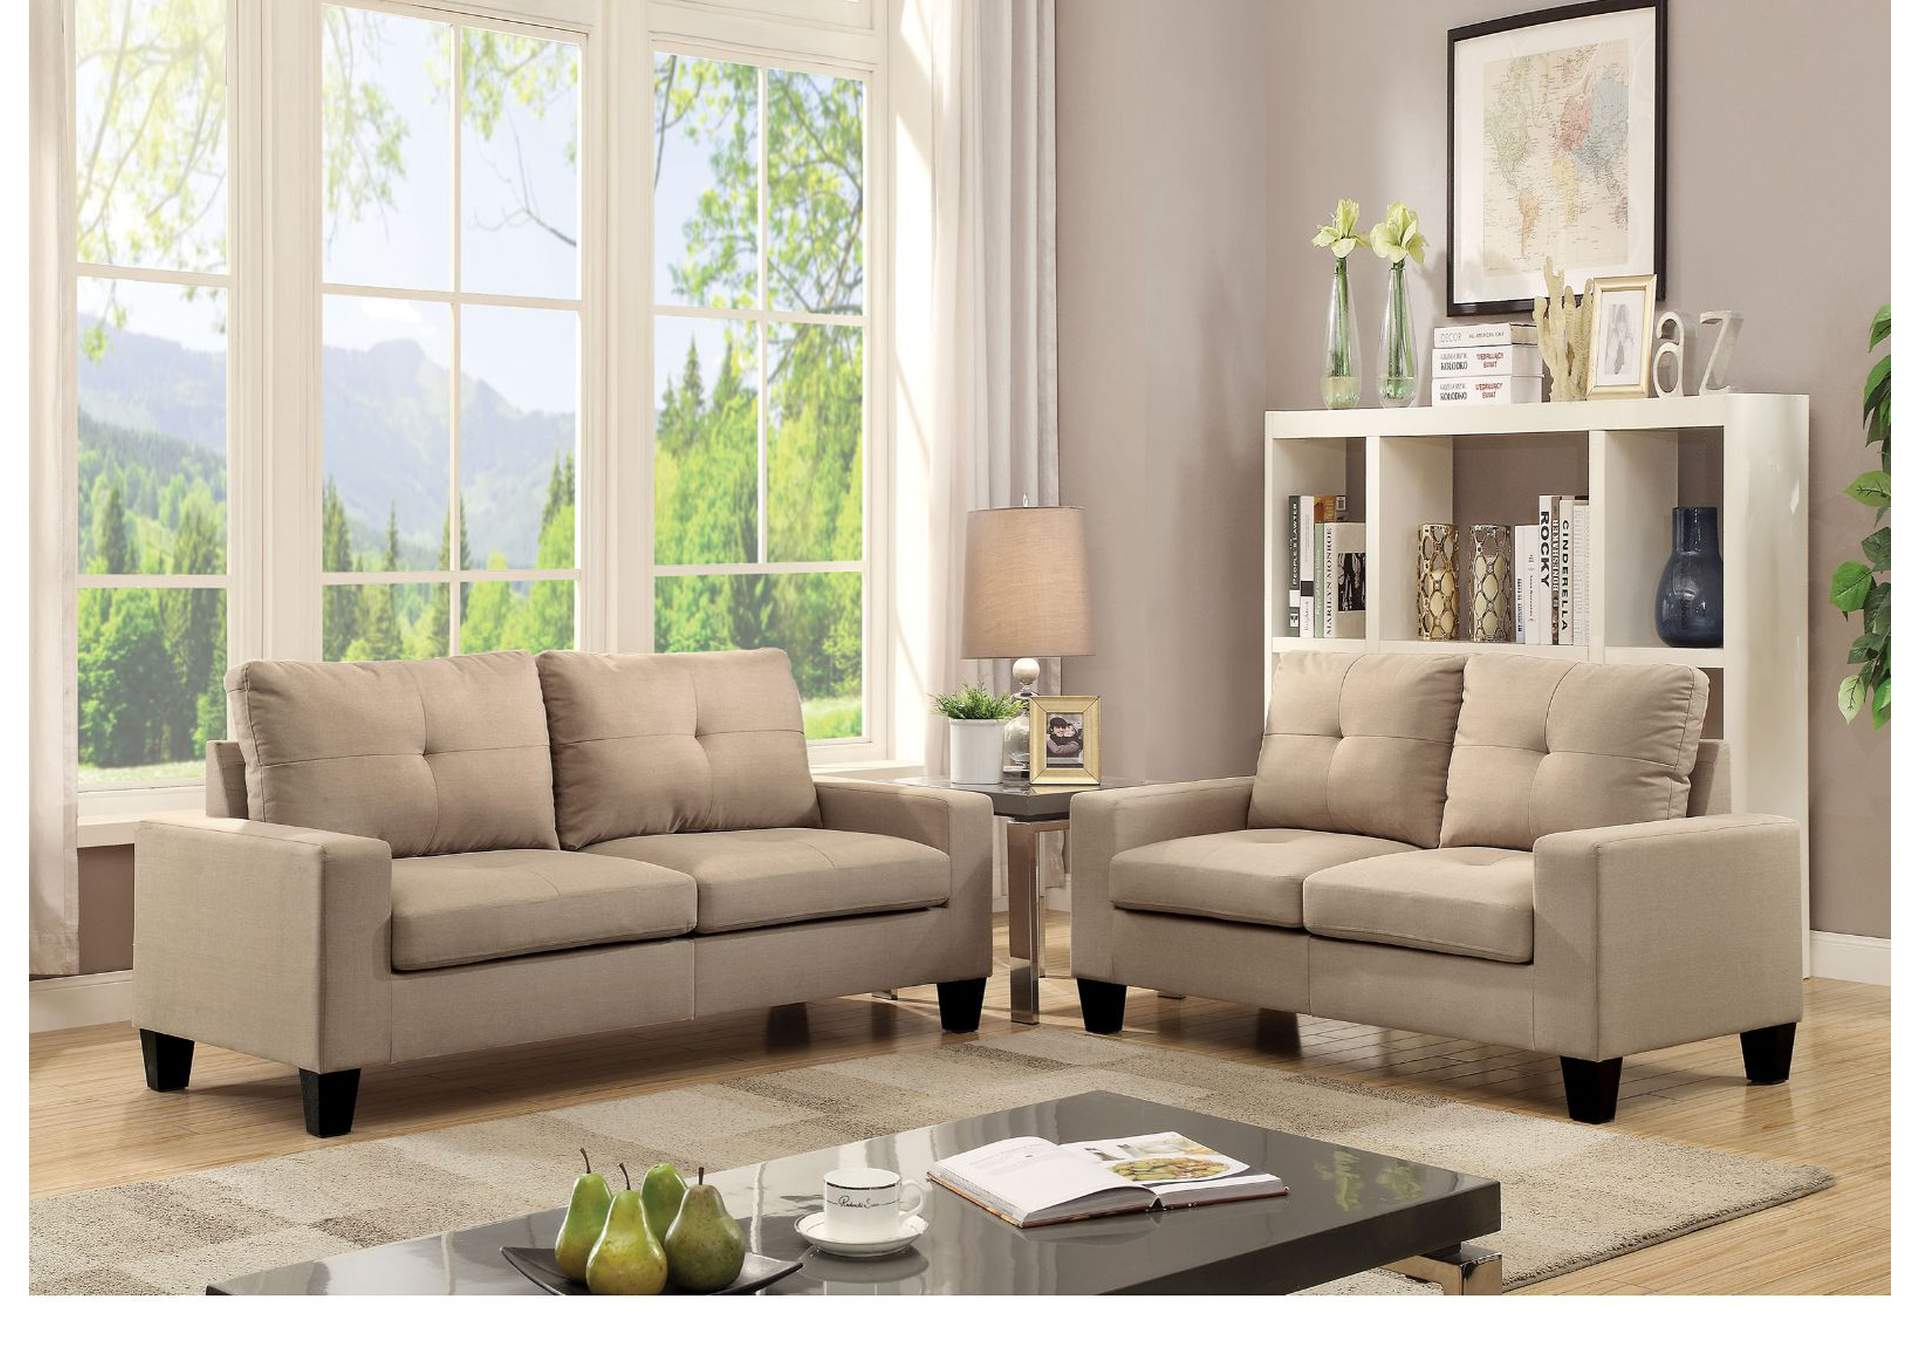 Pleasant Royal Furniture Gifts Platinum Ii Beige Linen Sofa Loveseat Interior Design Ideas Gentotryabchikinfo